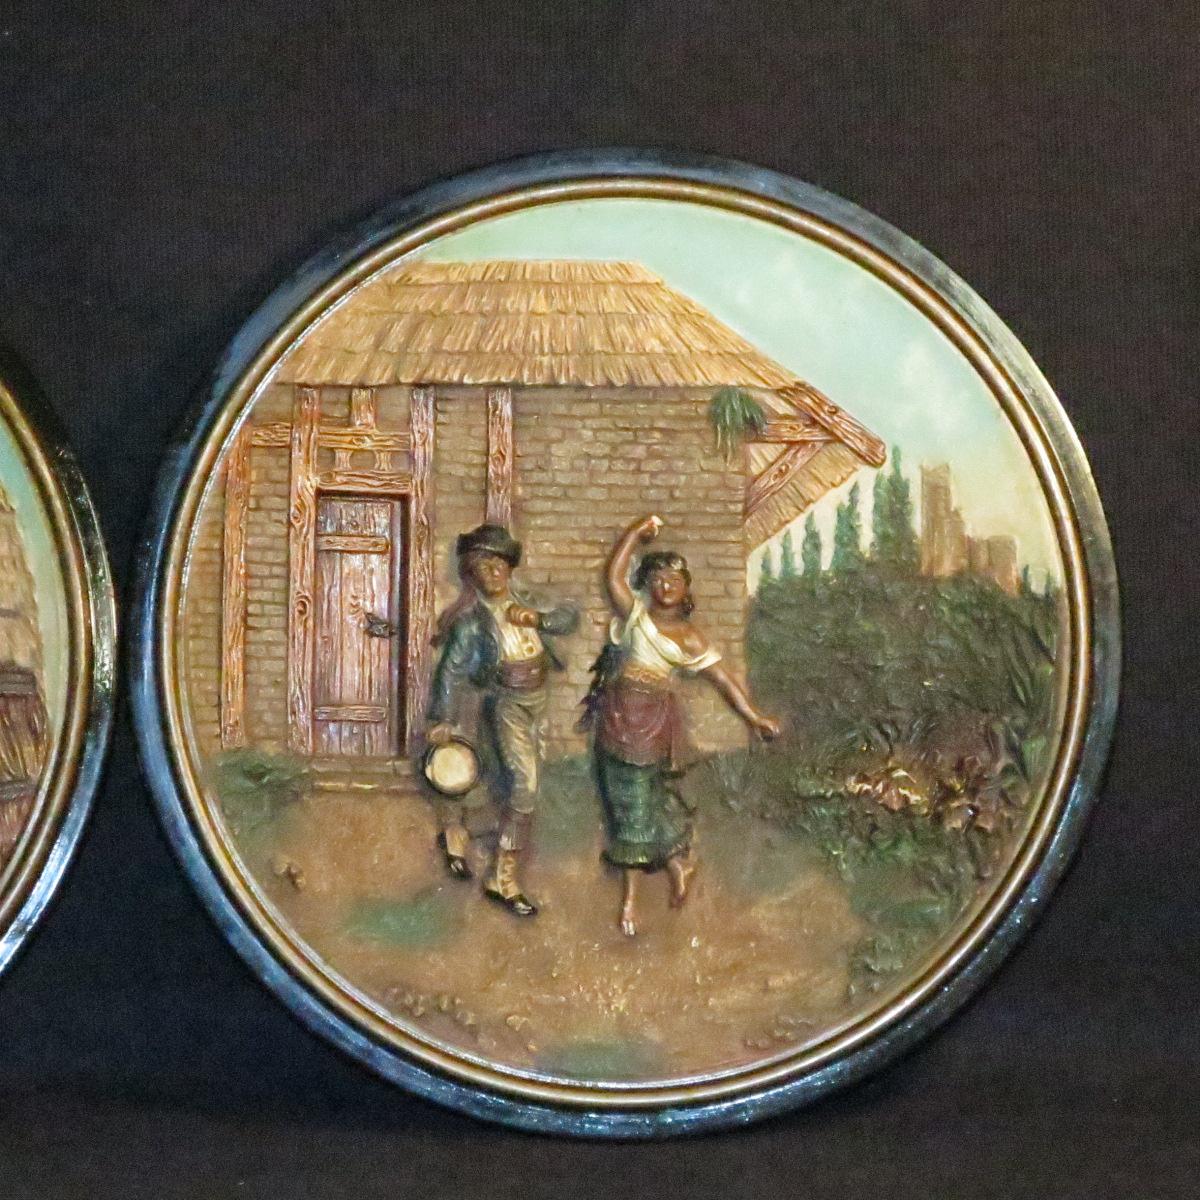 Johann Maresch Pair Of Plates Plates Pottery Central European Gypsies-photo-3